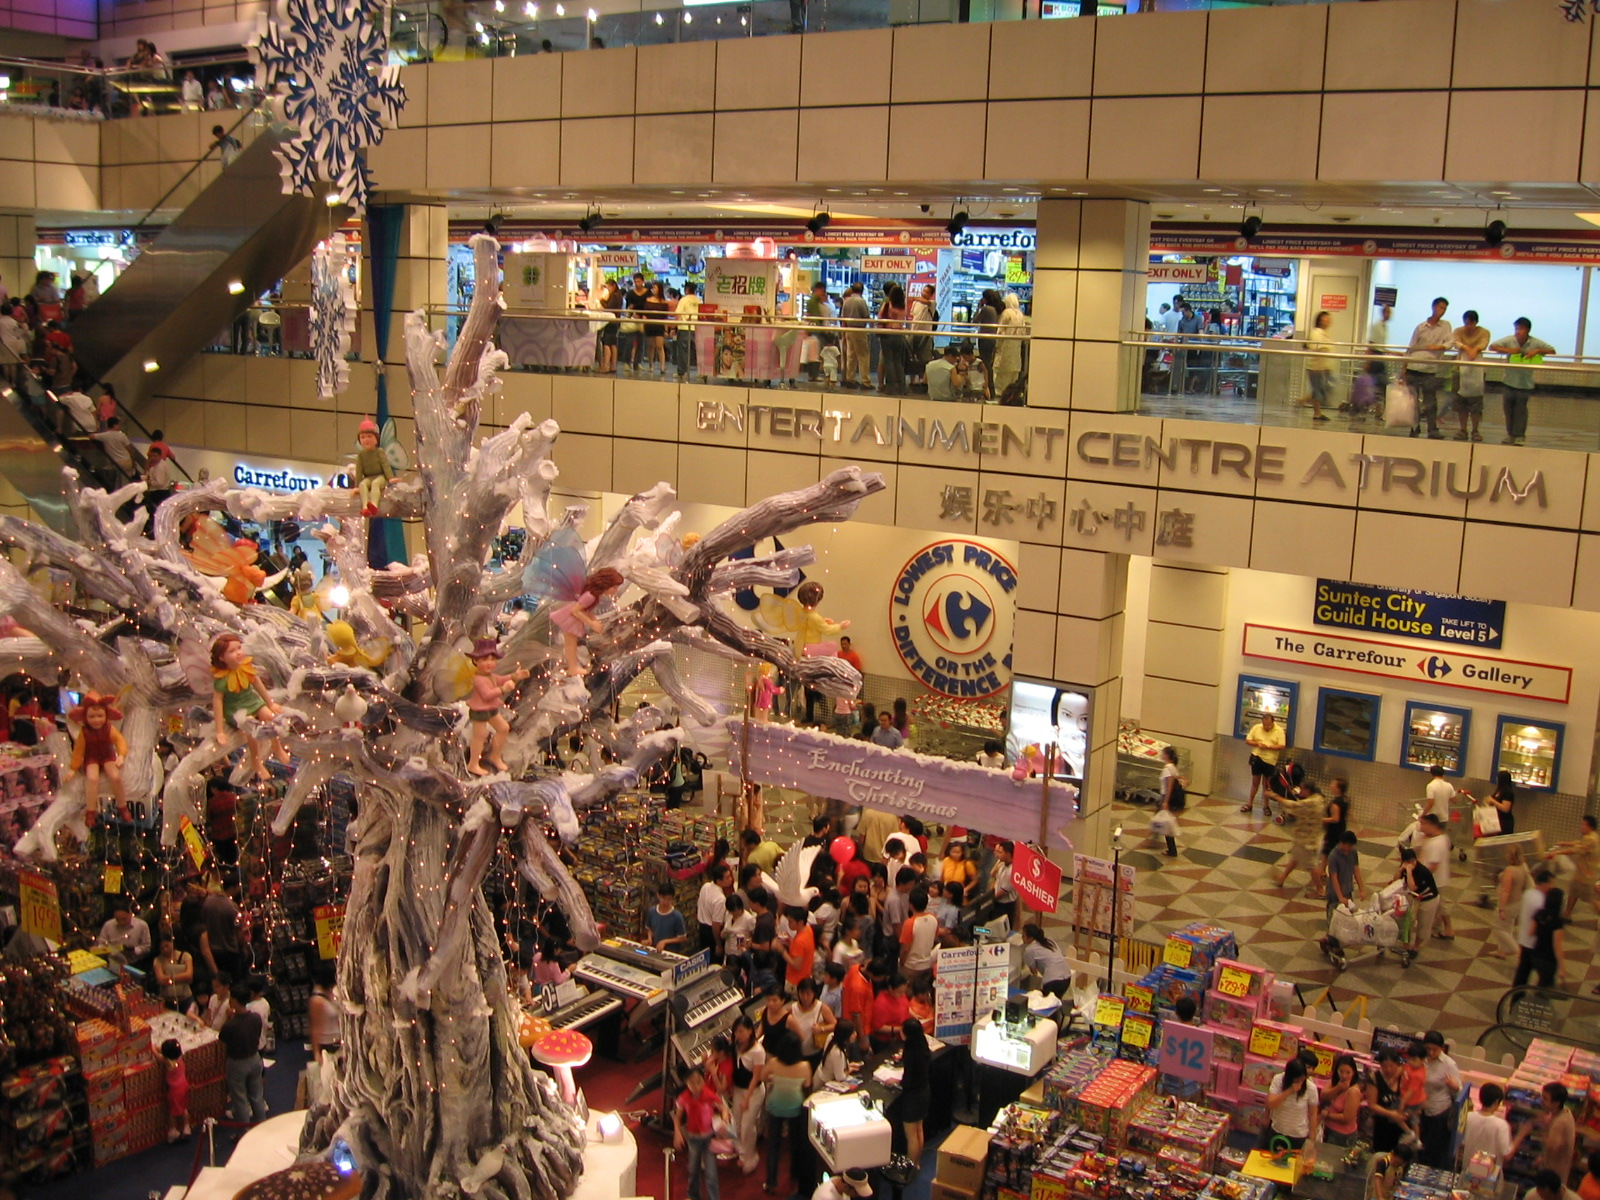 Suntec_City_Mall,_Entertainment_Centre_Atrium,_Dec_05